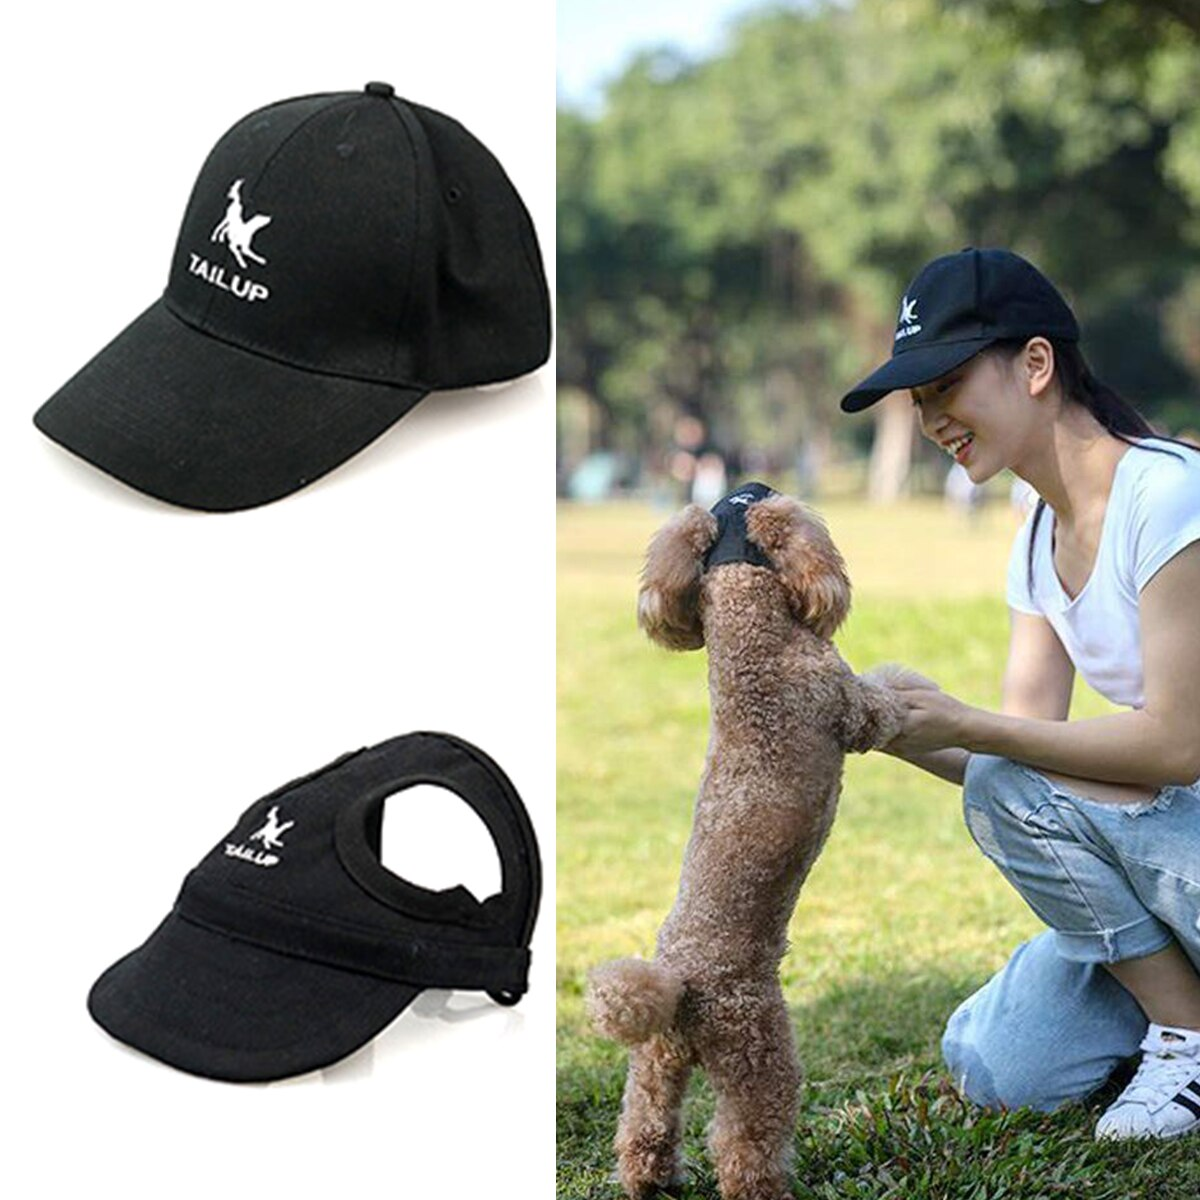 TINGHAO 2 unids/set lona perro mamá/papá familia gorra de béisbol a juego moda ajustable al aire libre mascota padre-hijo sombrero